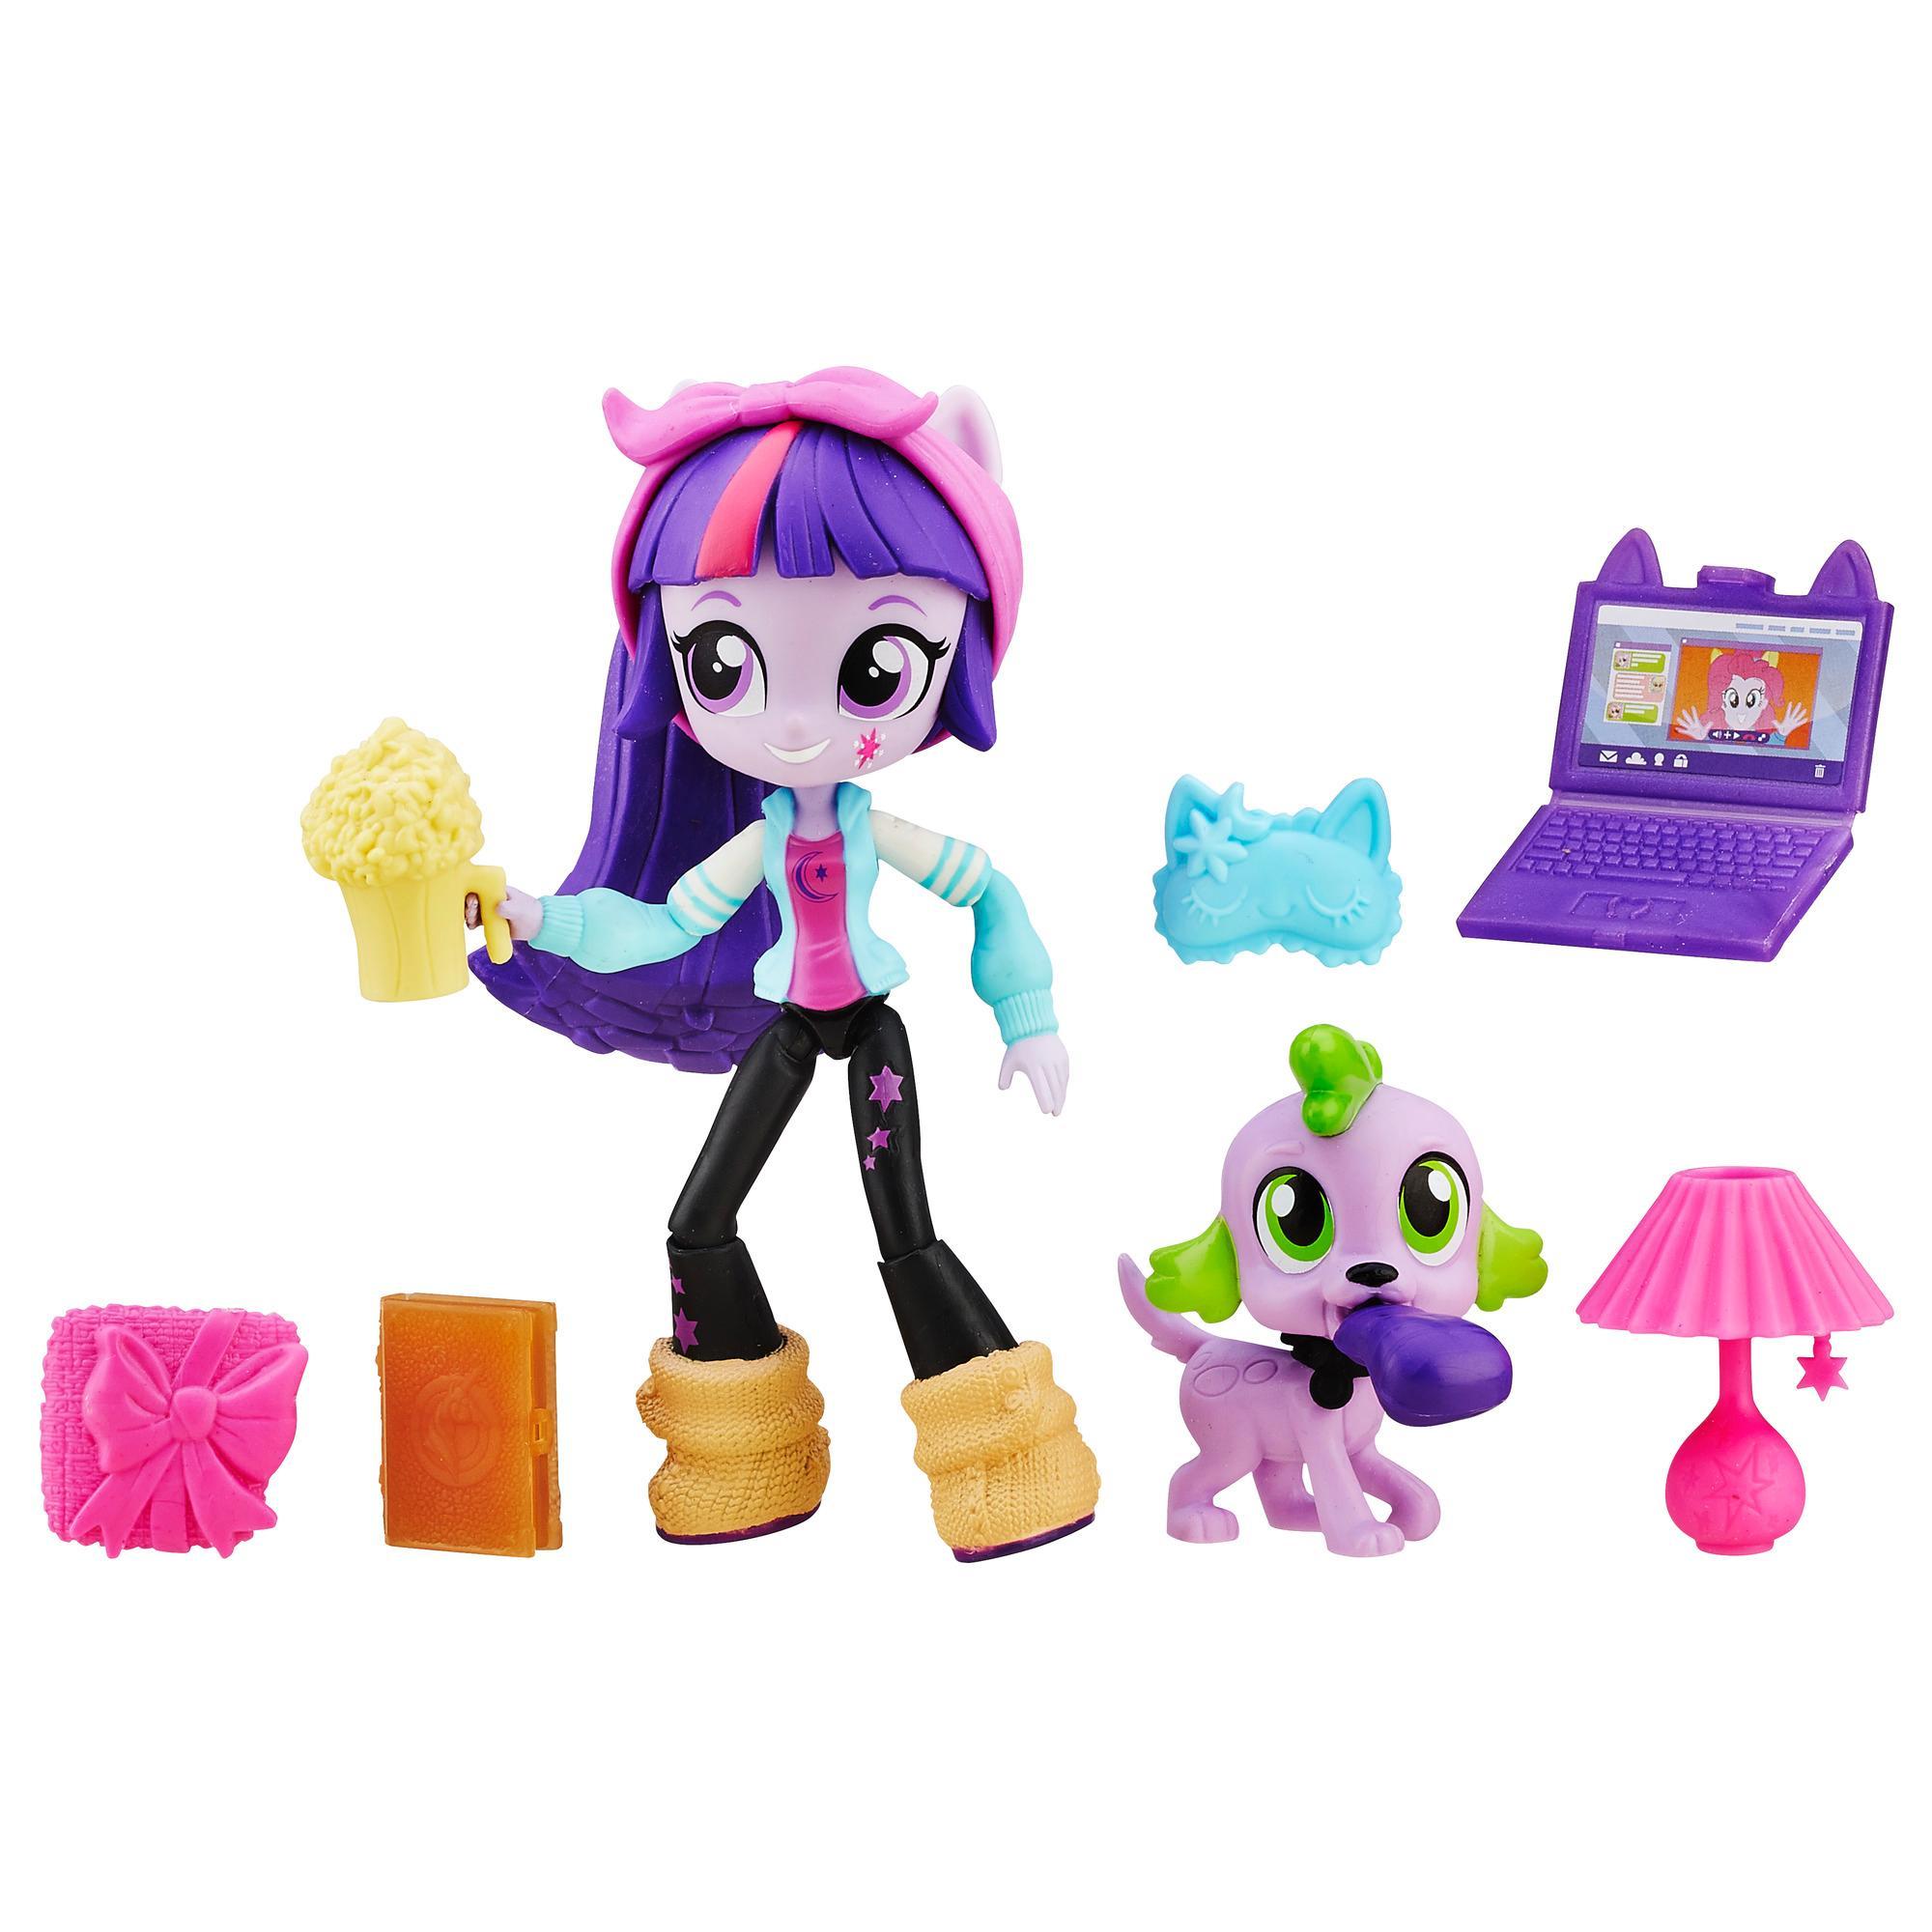 My little Pony Equestria girls Minis - Soirée pyjama Twilight Sparkle-